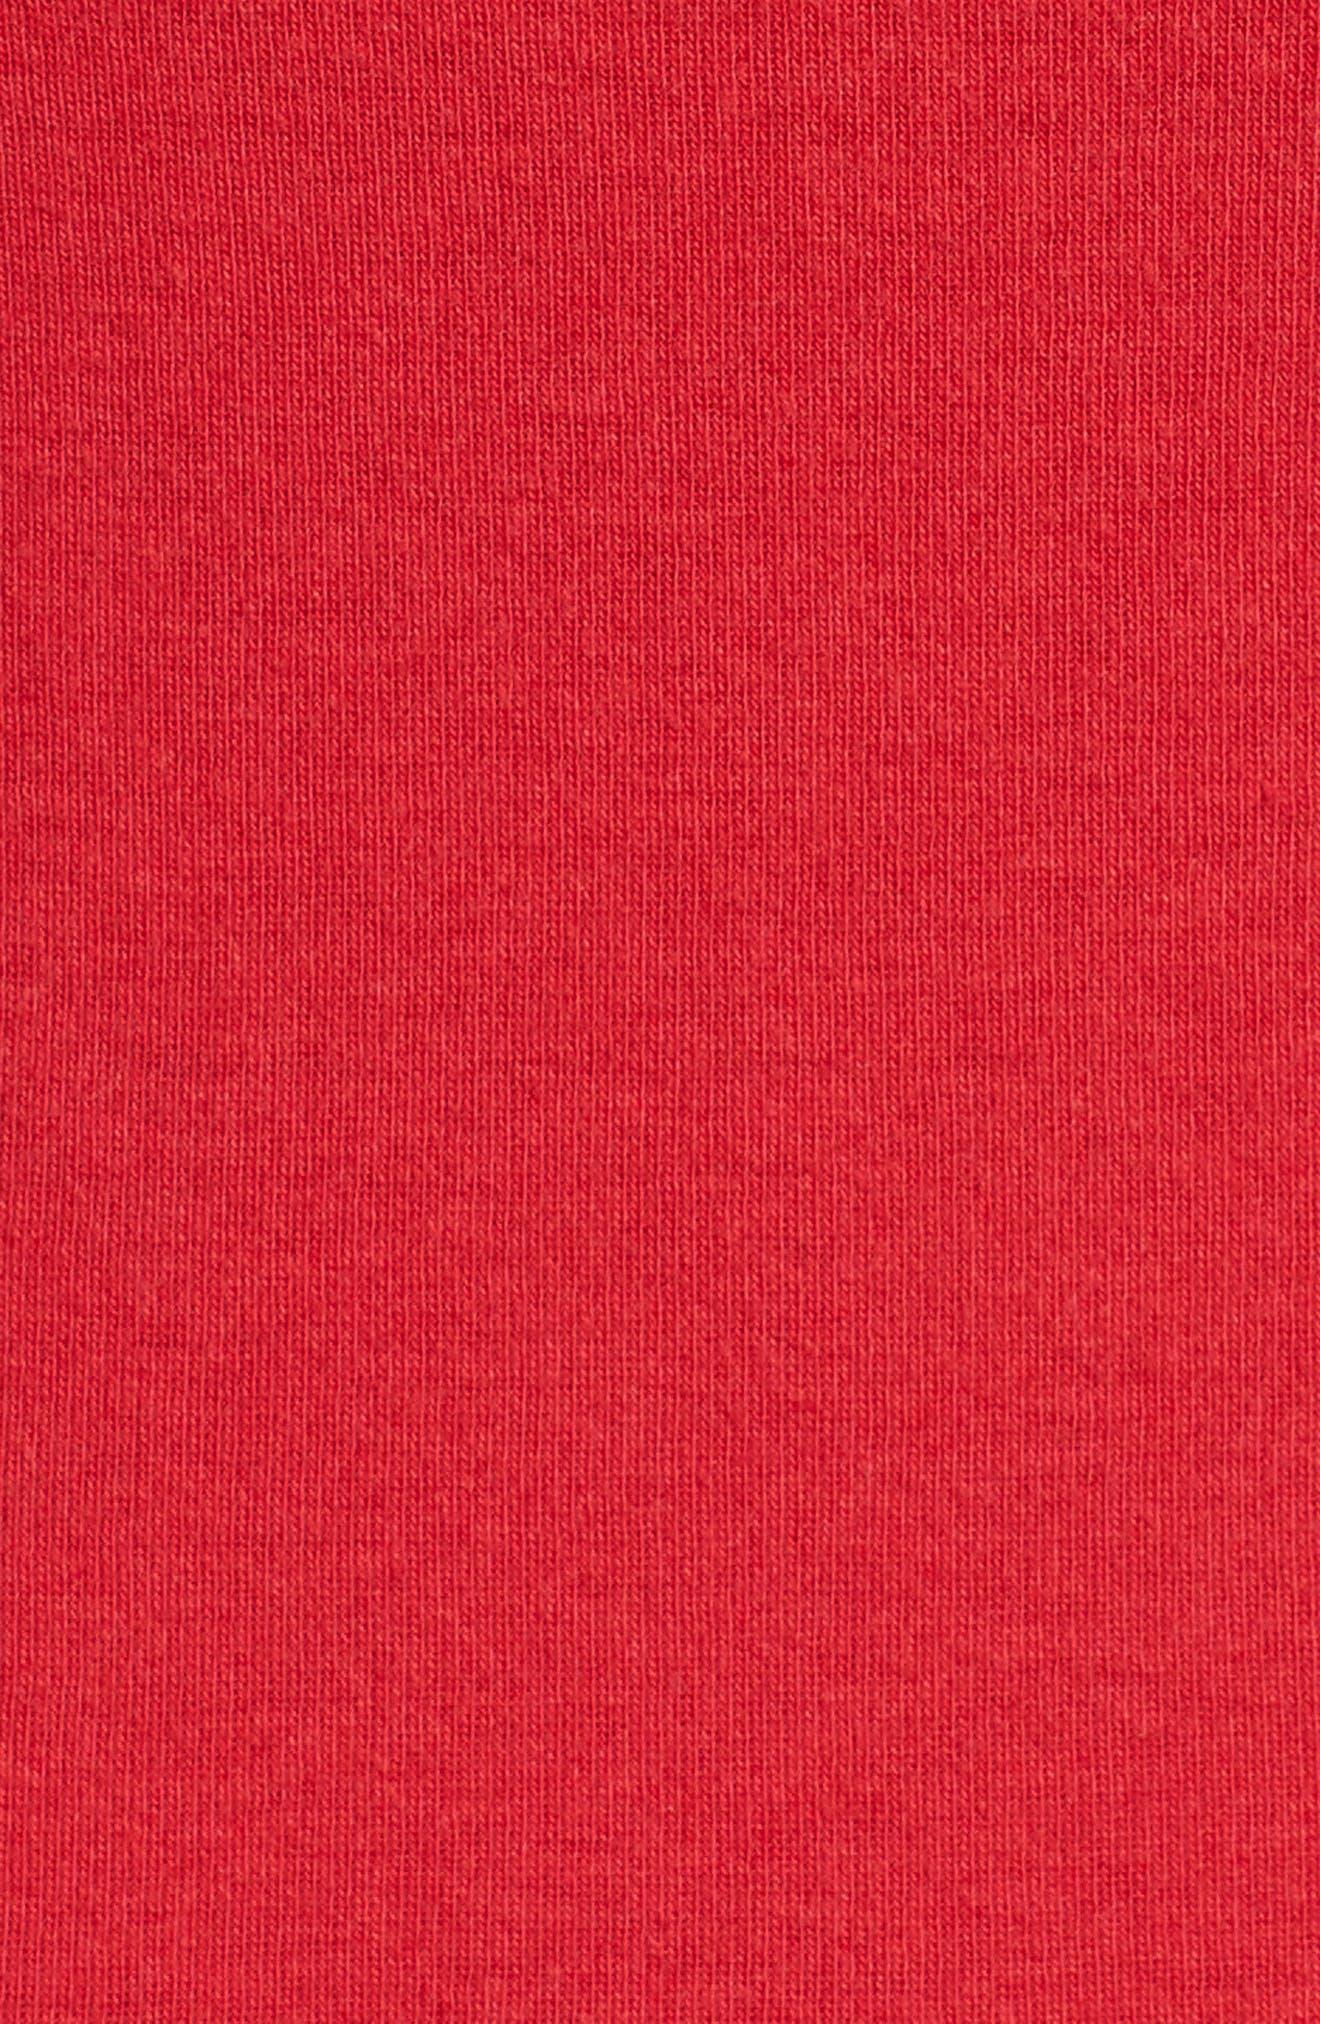 Ballet Neck Cotton & Modal Knit Elbow Sleeve Tee,                             Alternate thumbnail 228, color,